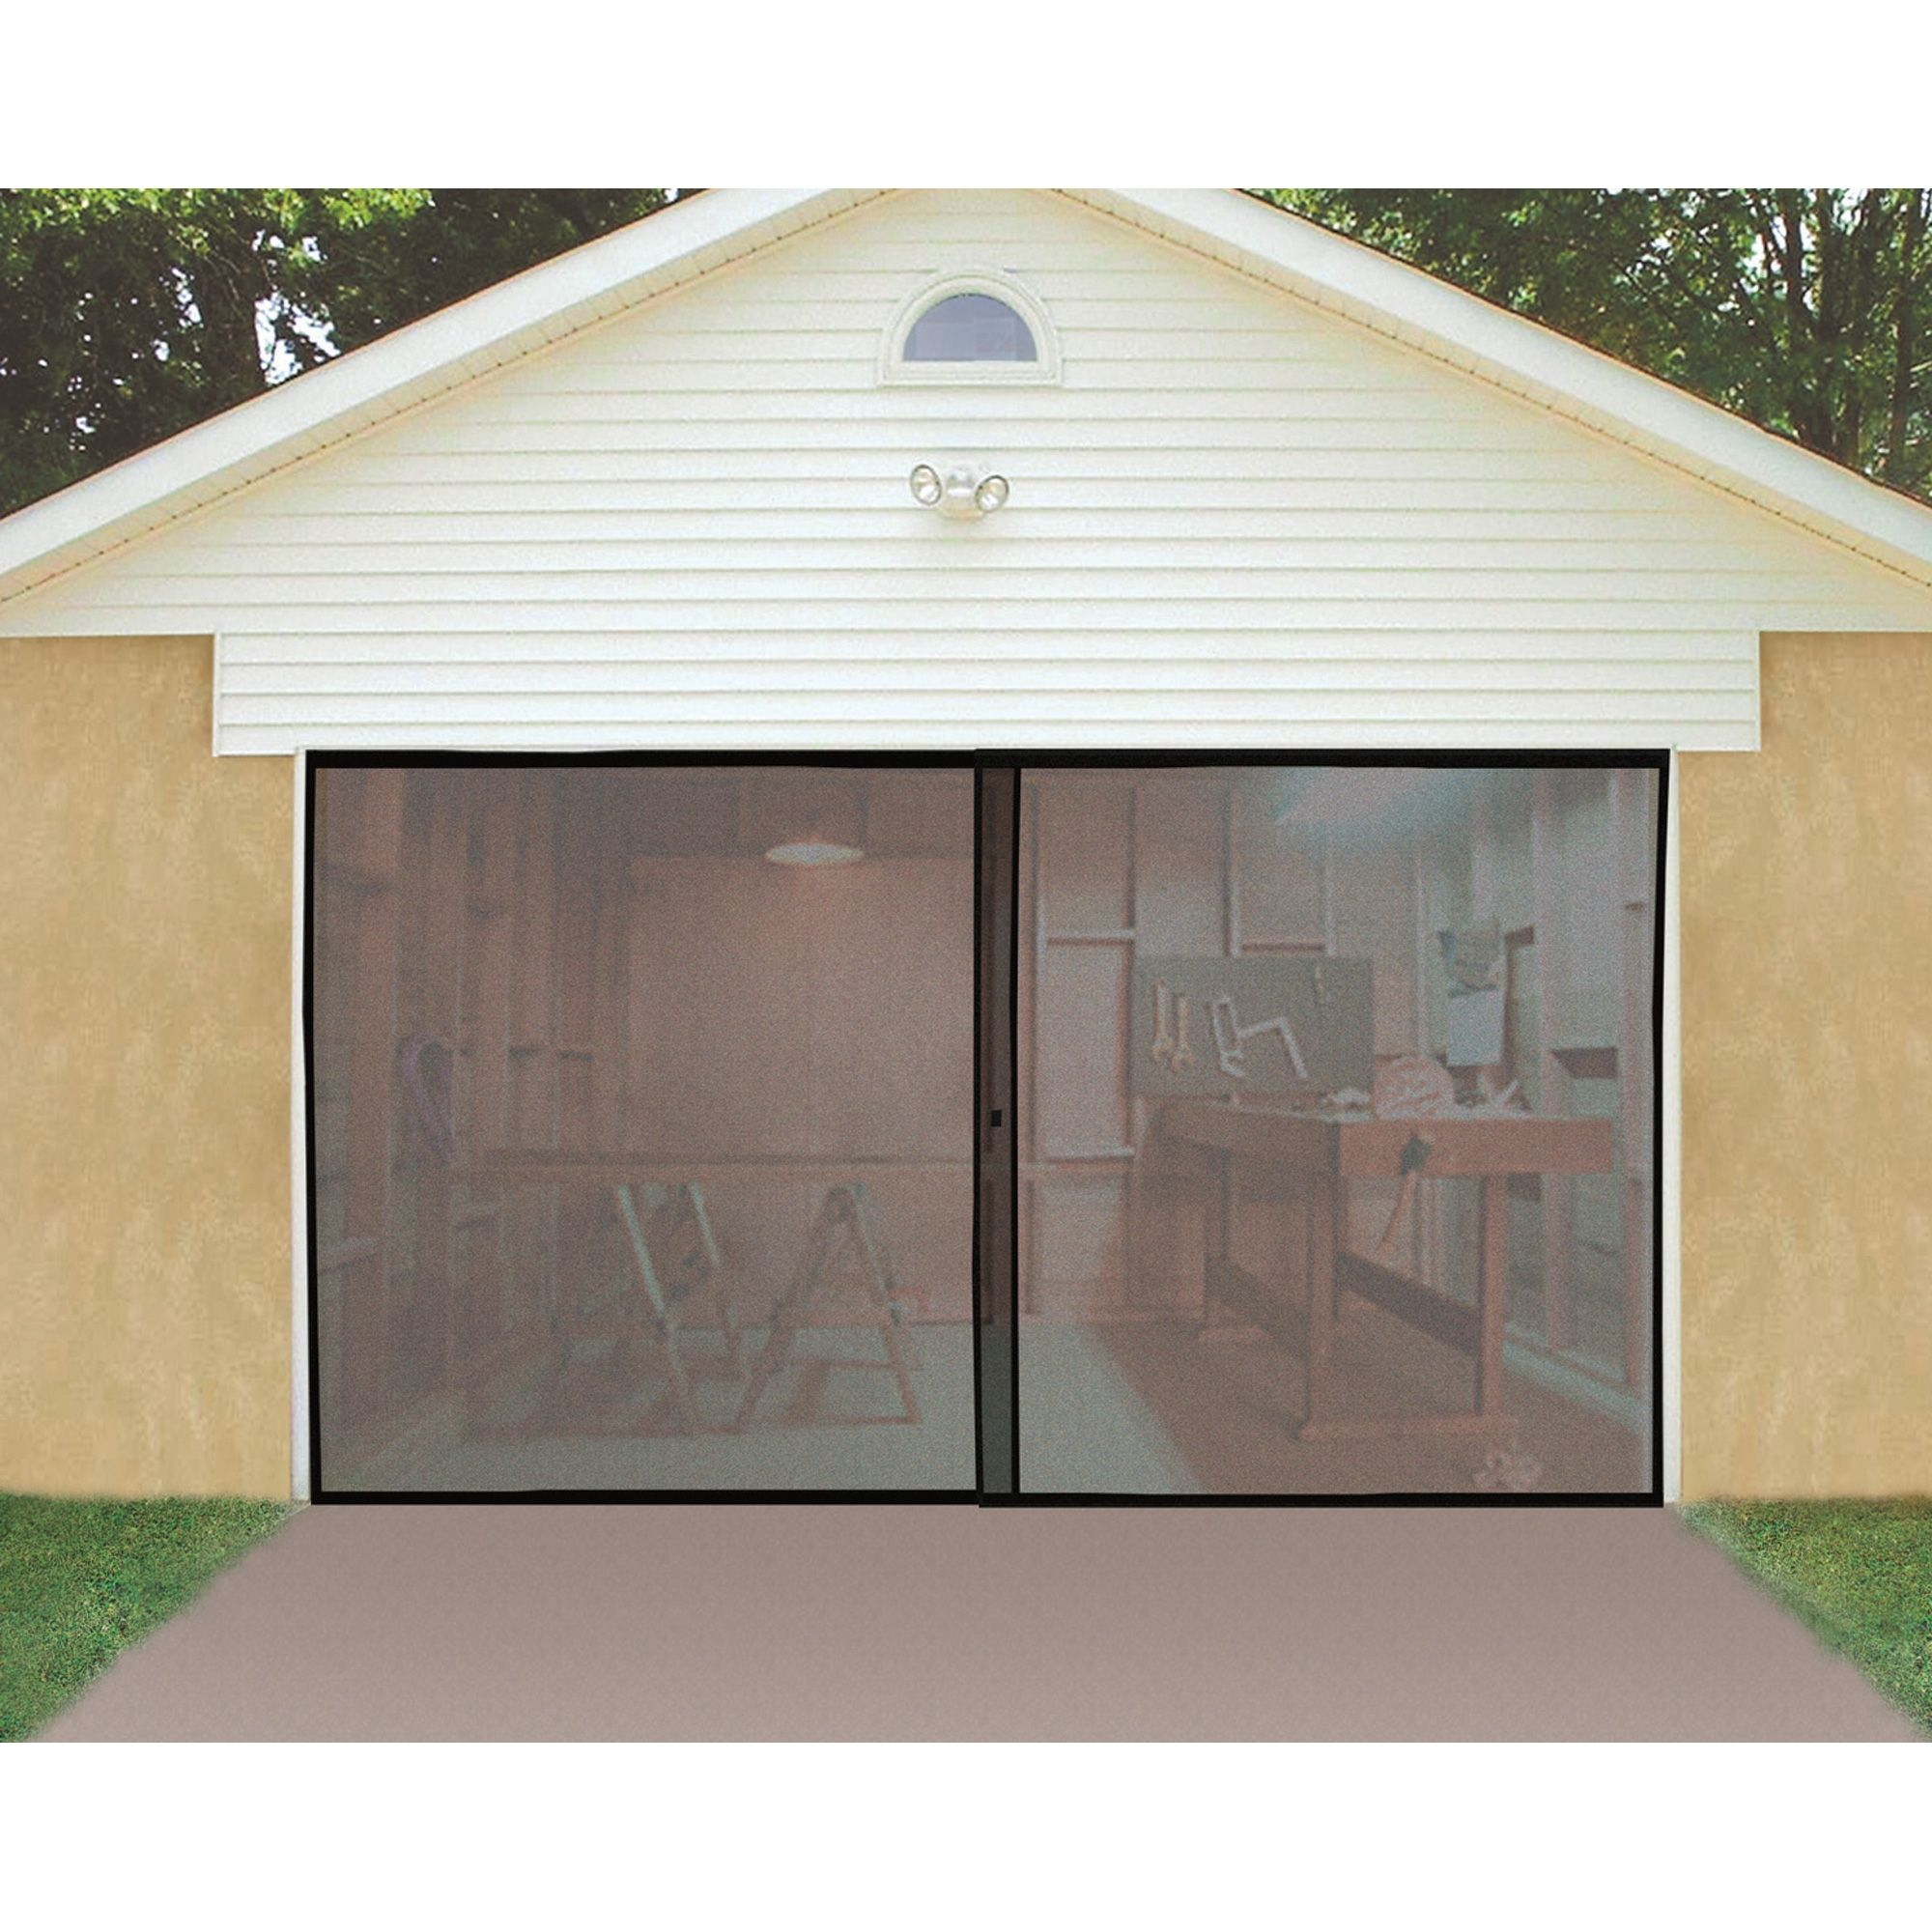 sale accents cheap impressive house screen worth carriage buy fort online wonderful doors garage parts panels overhead door for